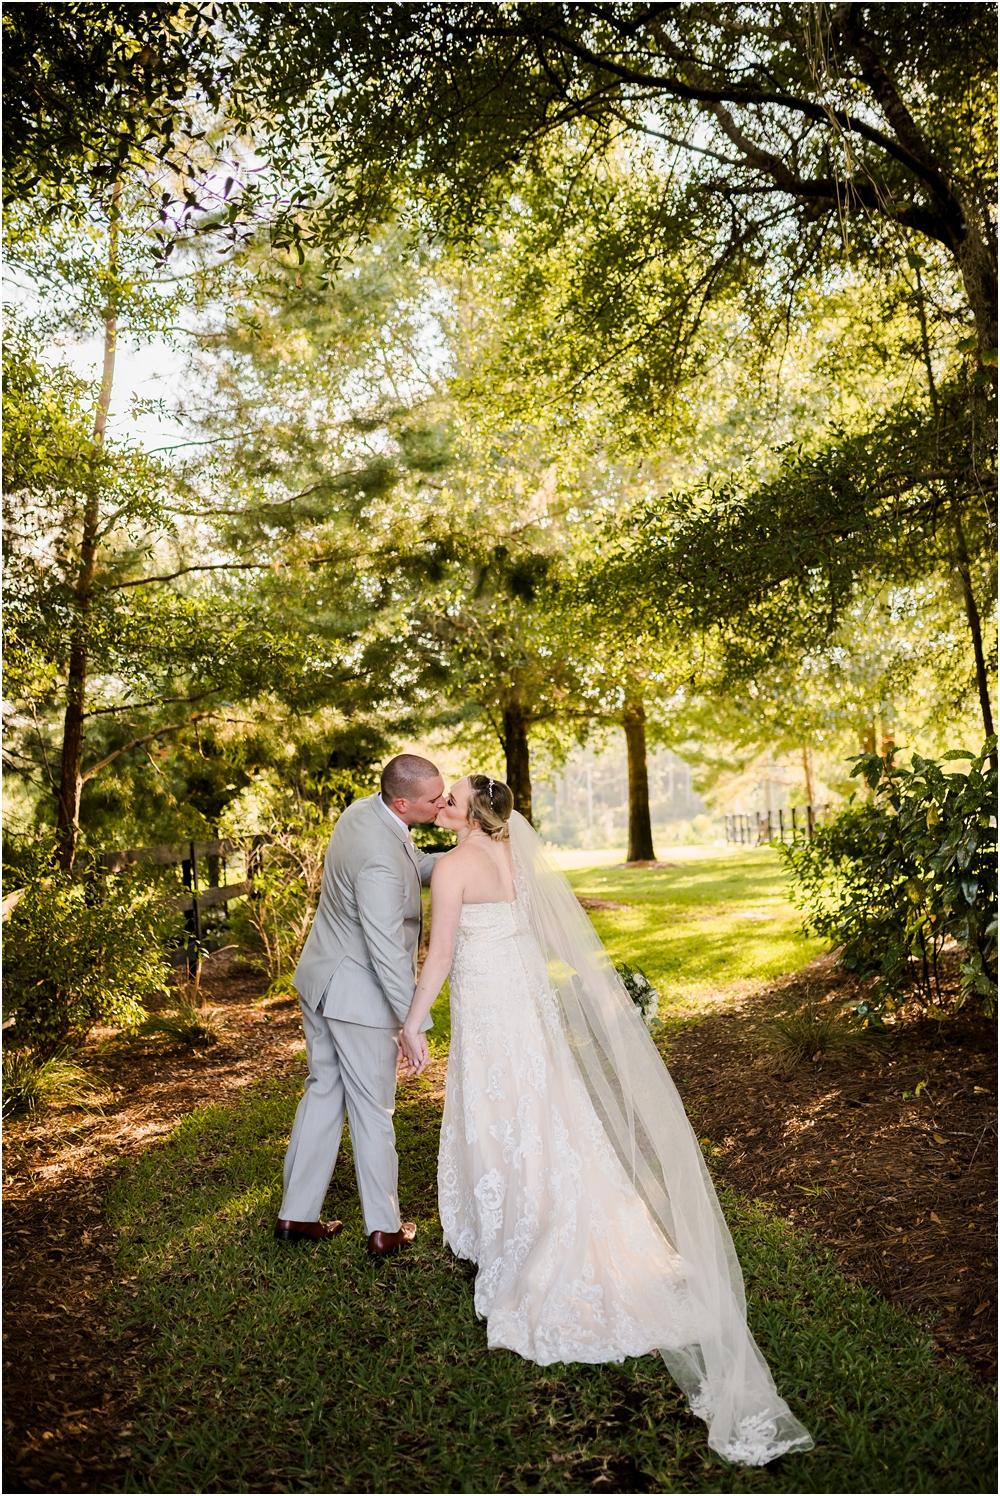 matthew-wedding-kiersten-stevenson-photography-30a-panama-city-beach-dothan-tallahassee-(152-of-579).JPG